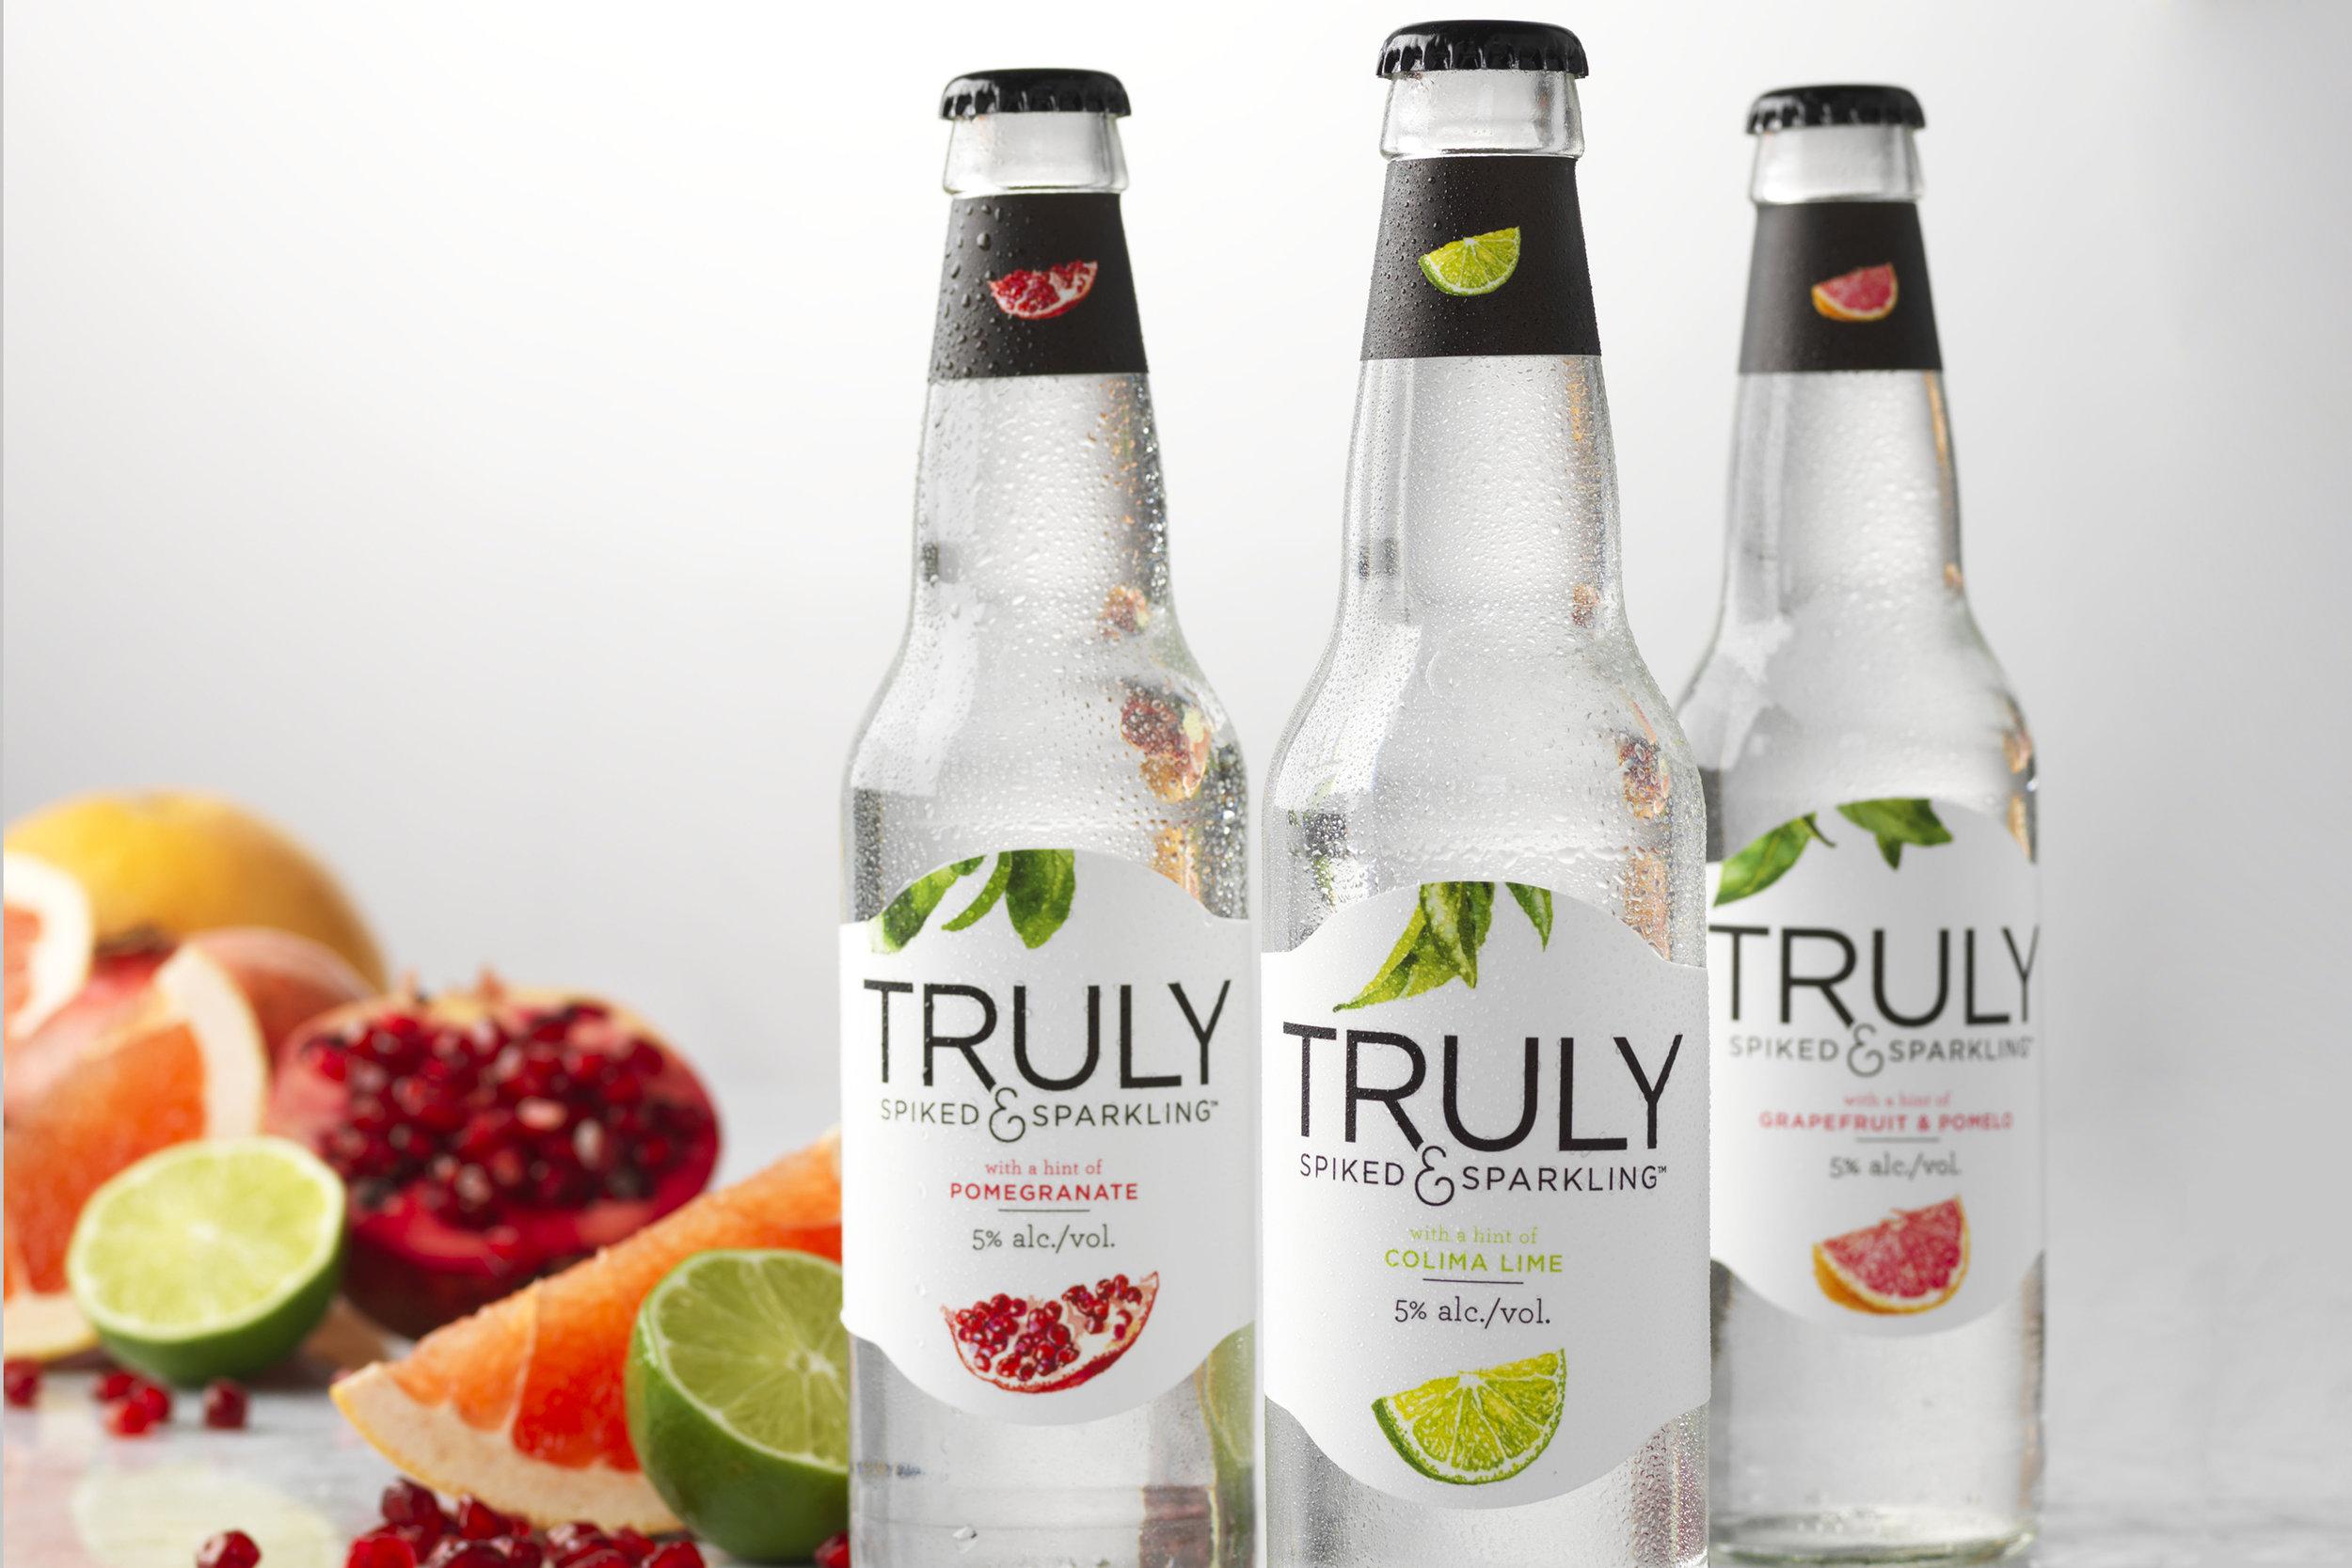 truly_bottles_1-1.jpg